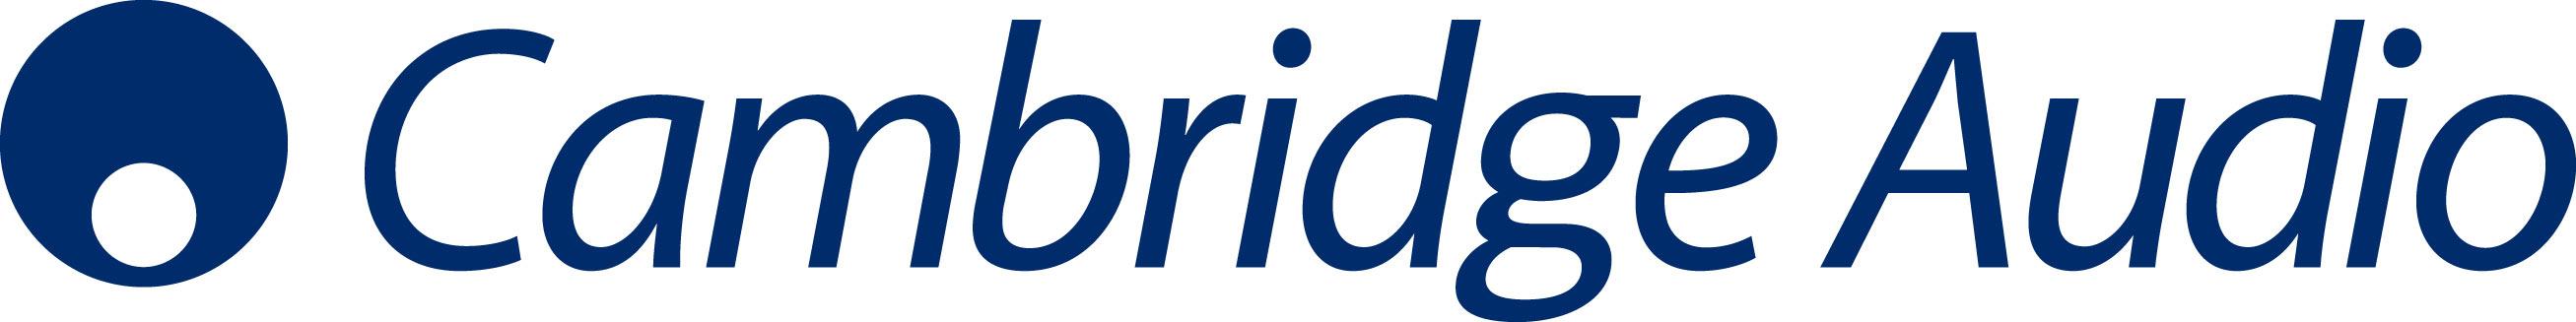 cambridge-audio-logo.jpg